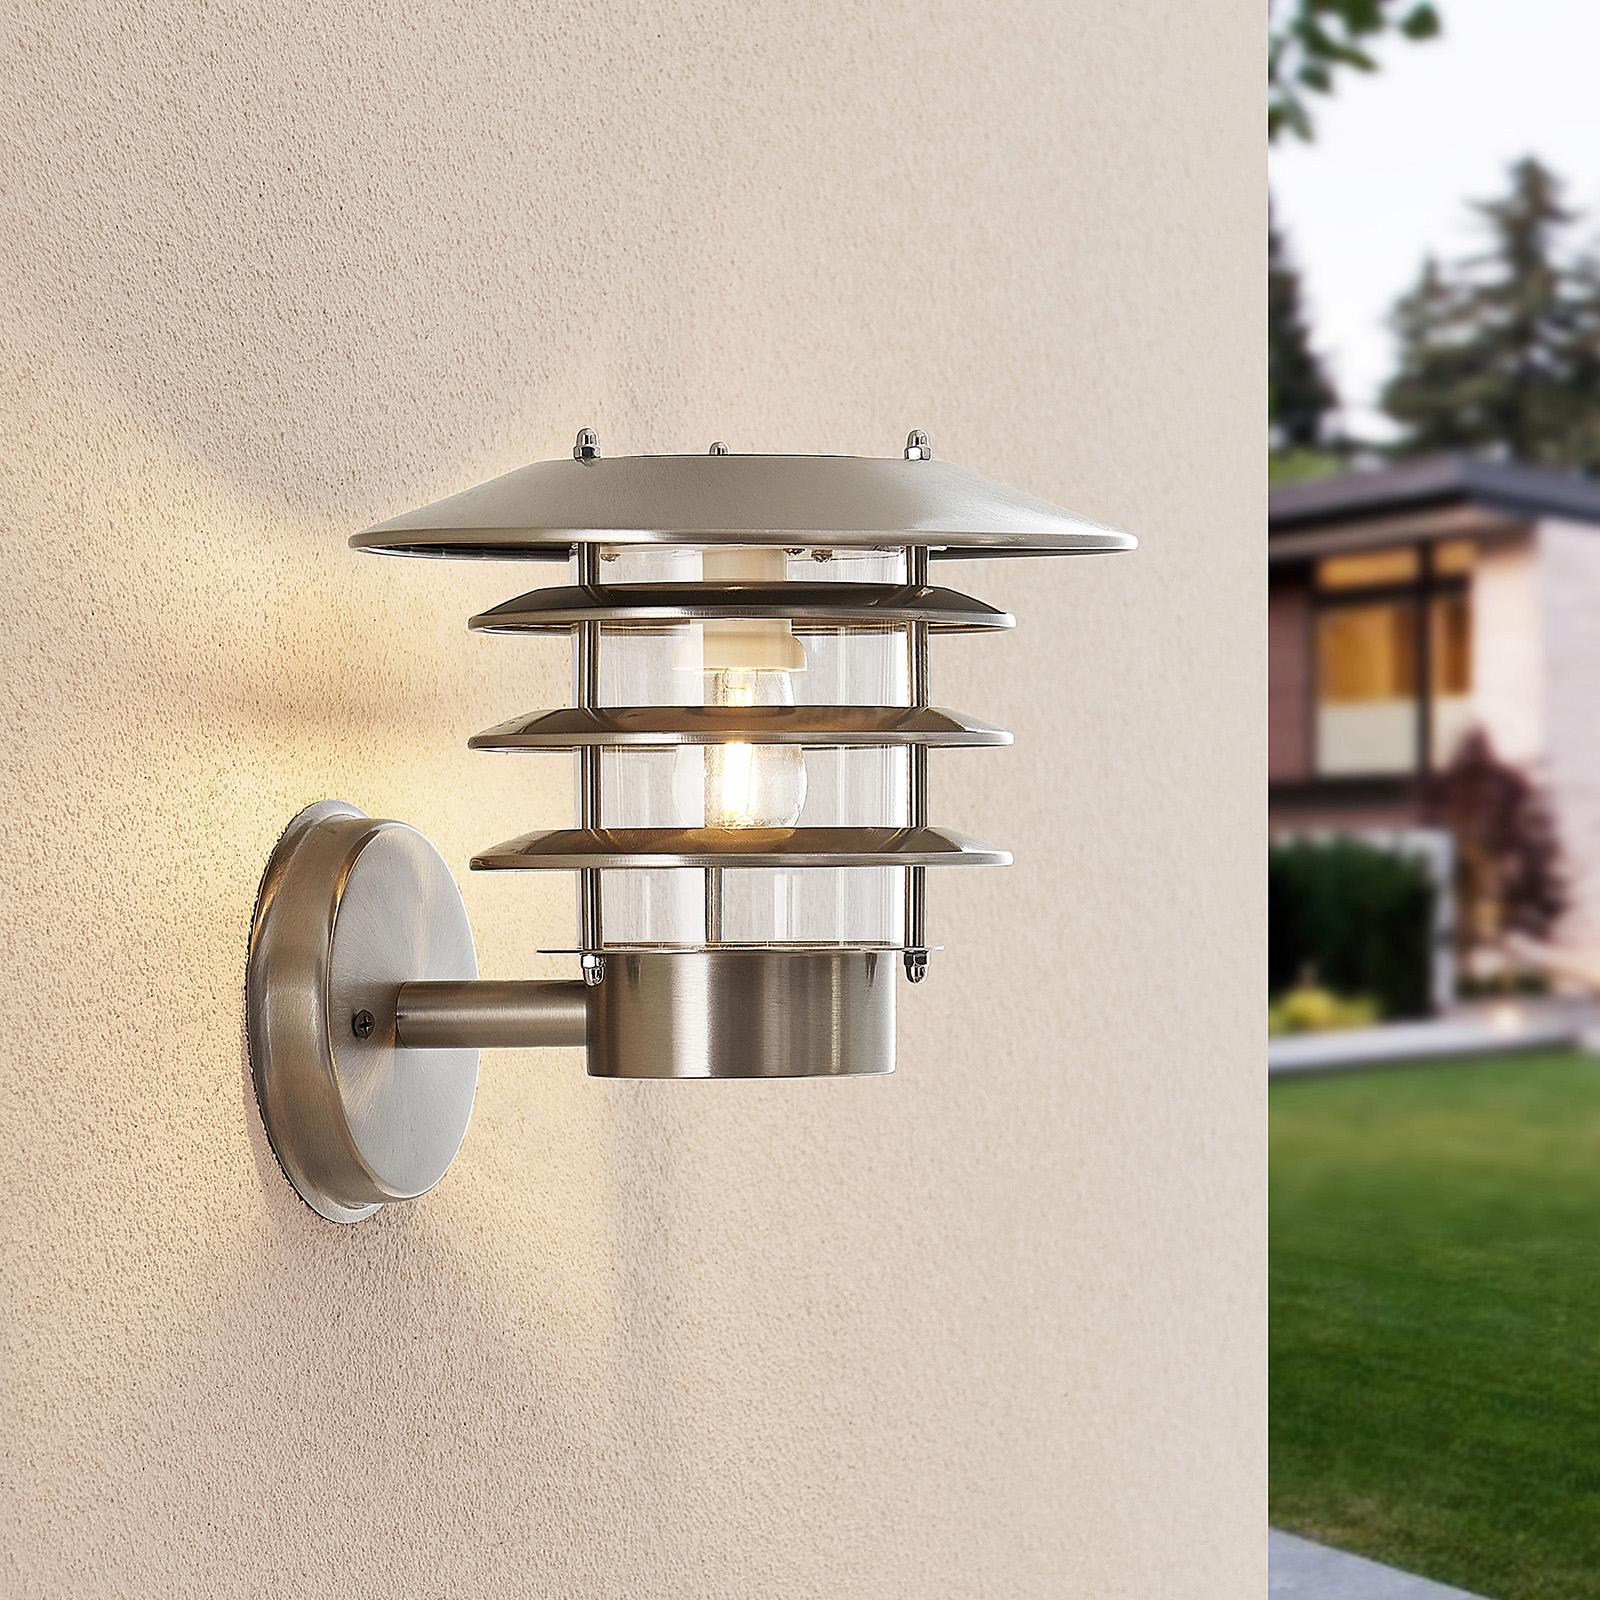 Lindby Dimara solcellsdriven LED-utomhusvägglampa